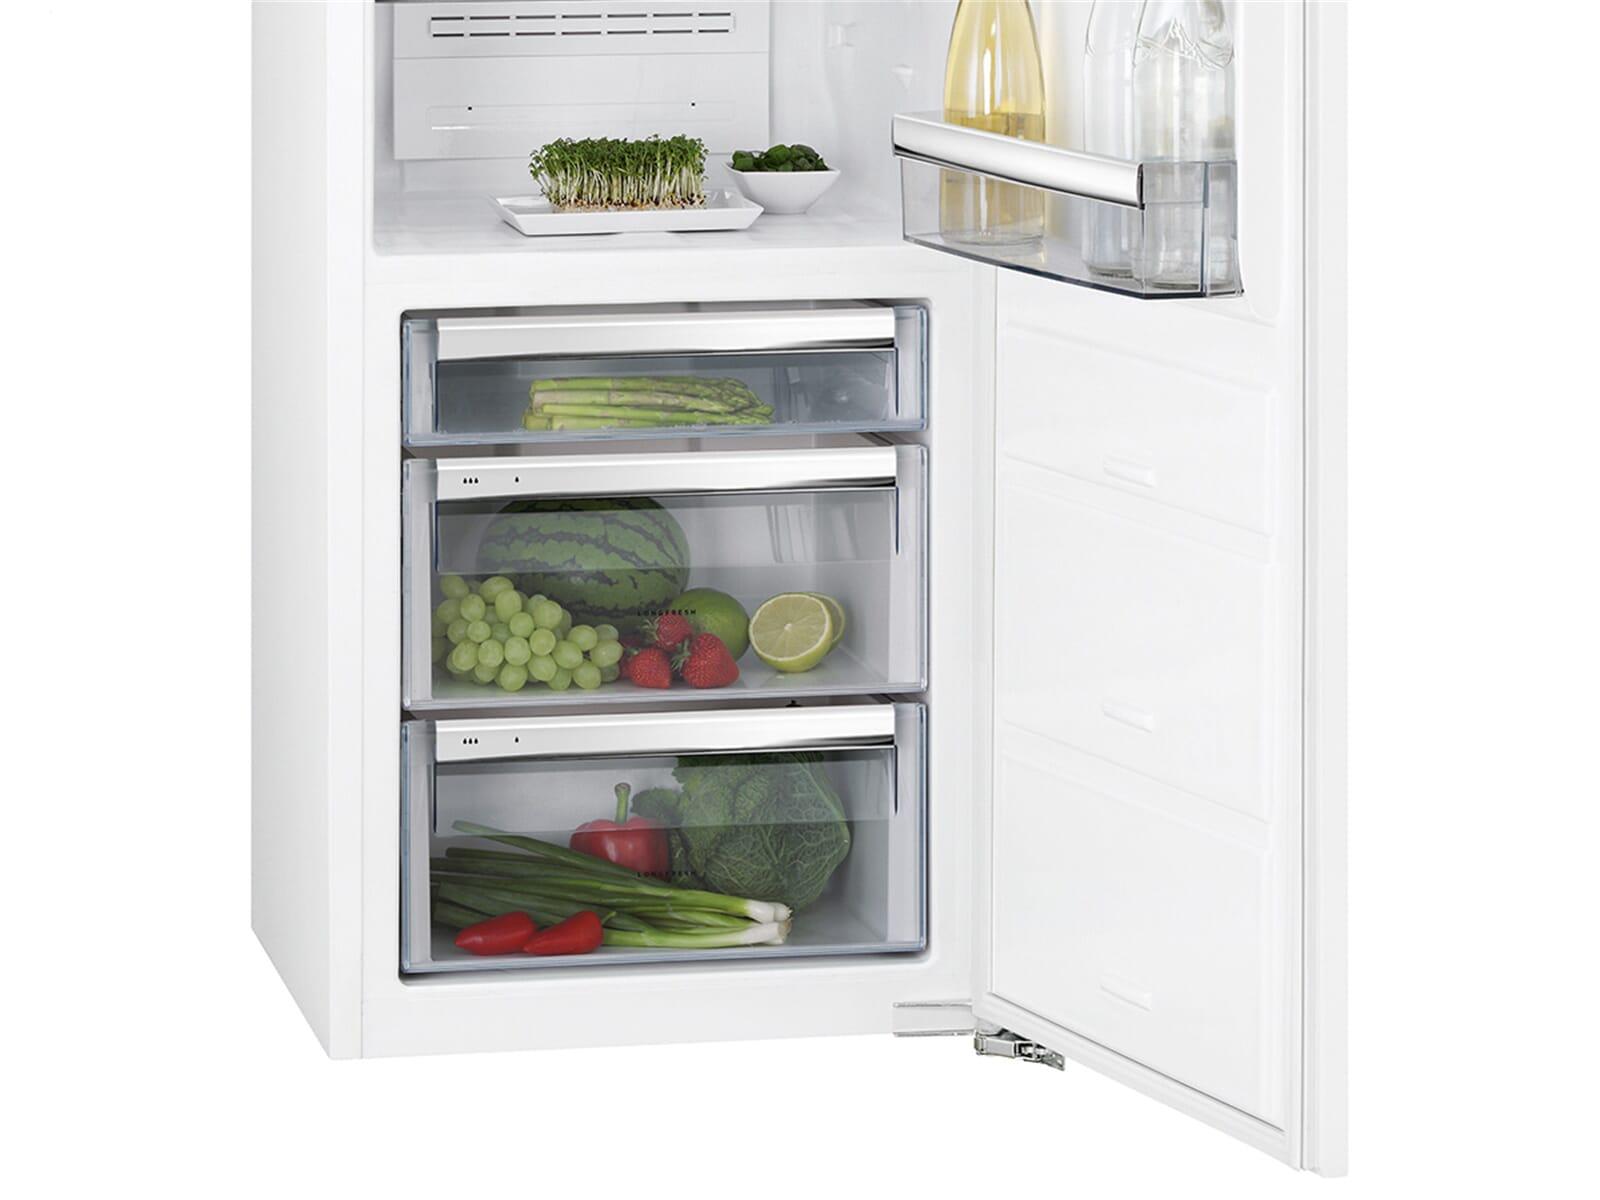 Aeg Kühlschrank Biofresh : Aeg sfe zc einbaukühlschrank